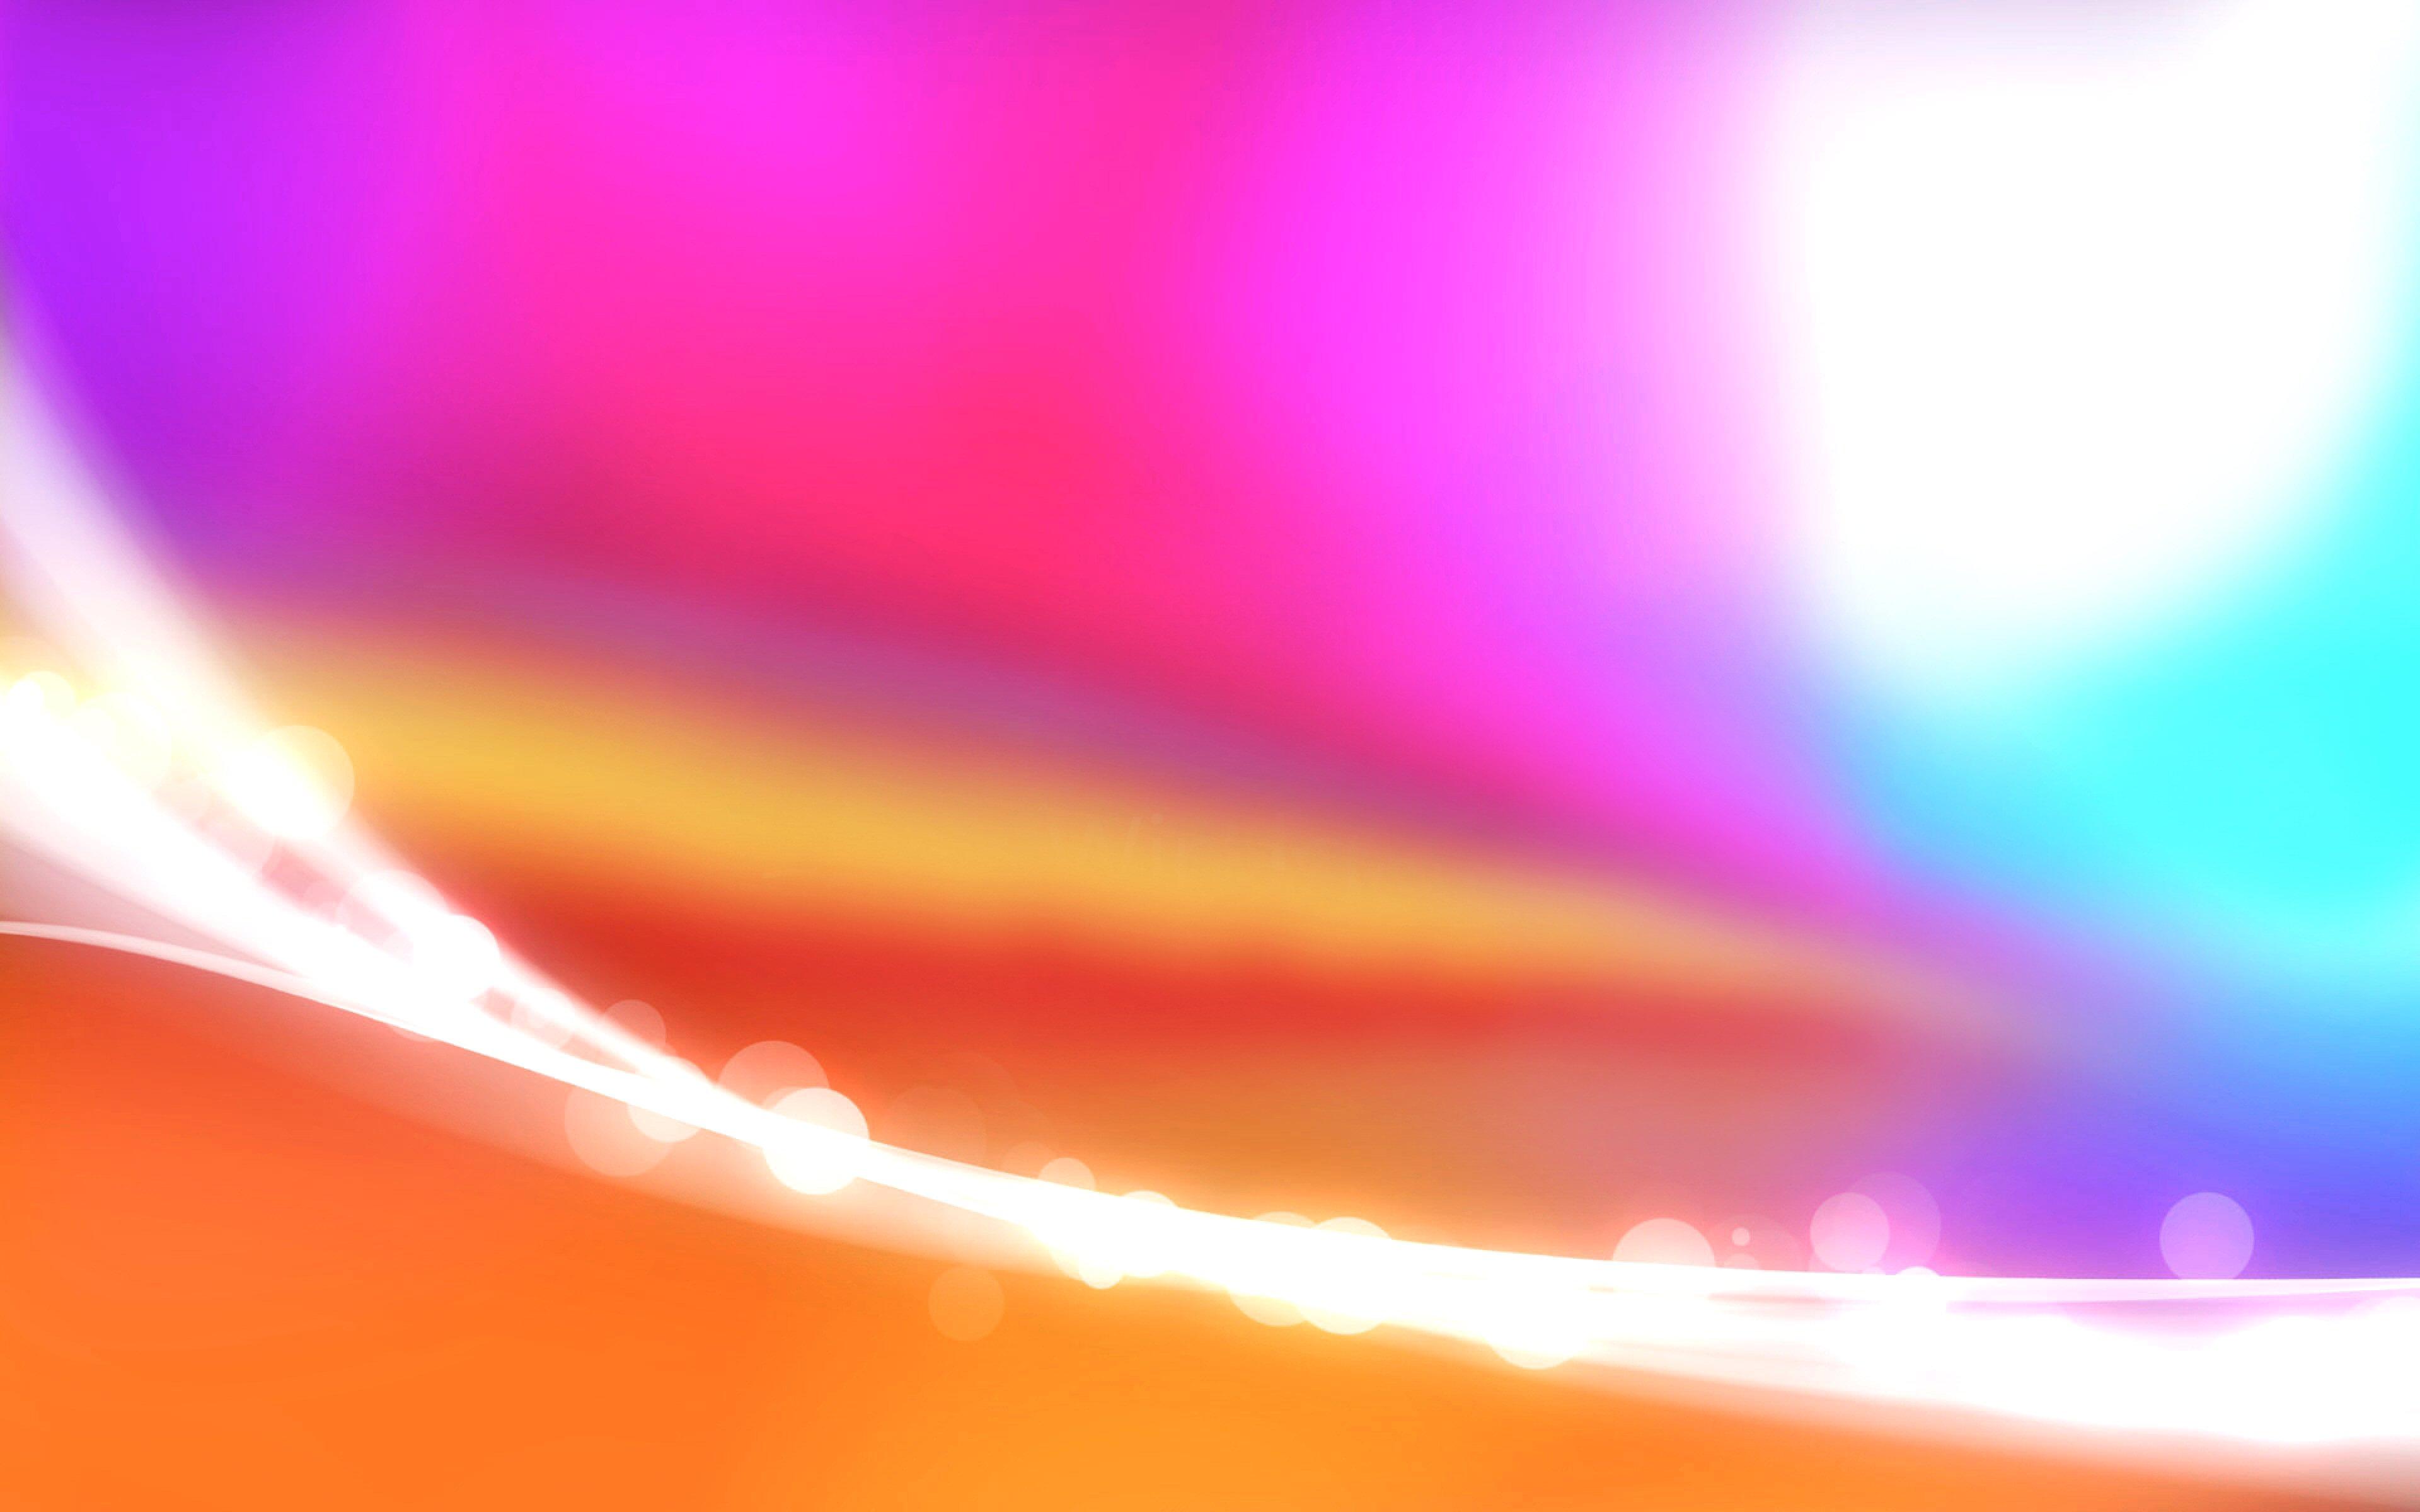 Colores 4k Ultra Fondo De Pantalla HD